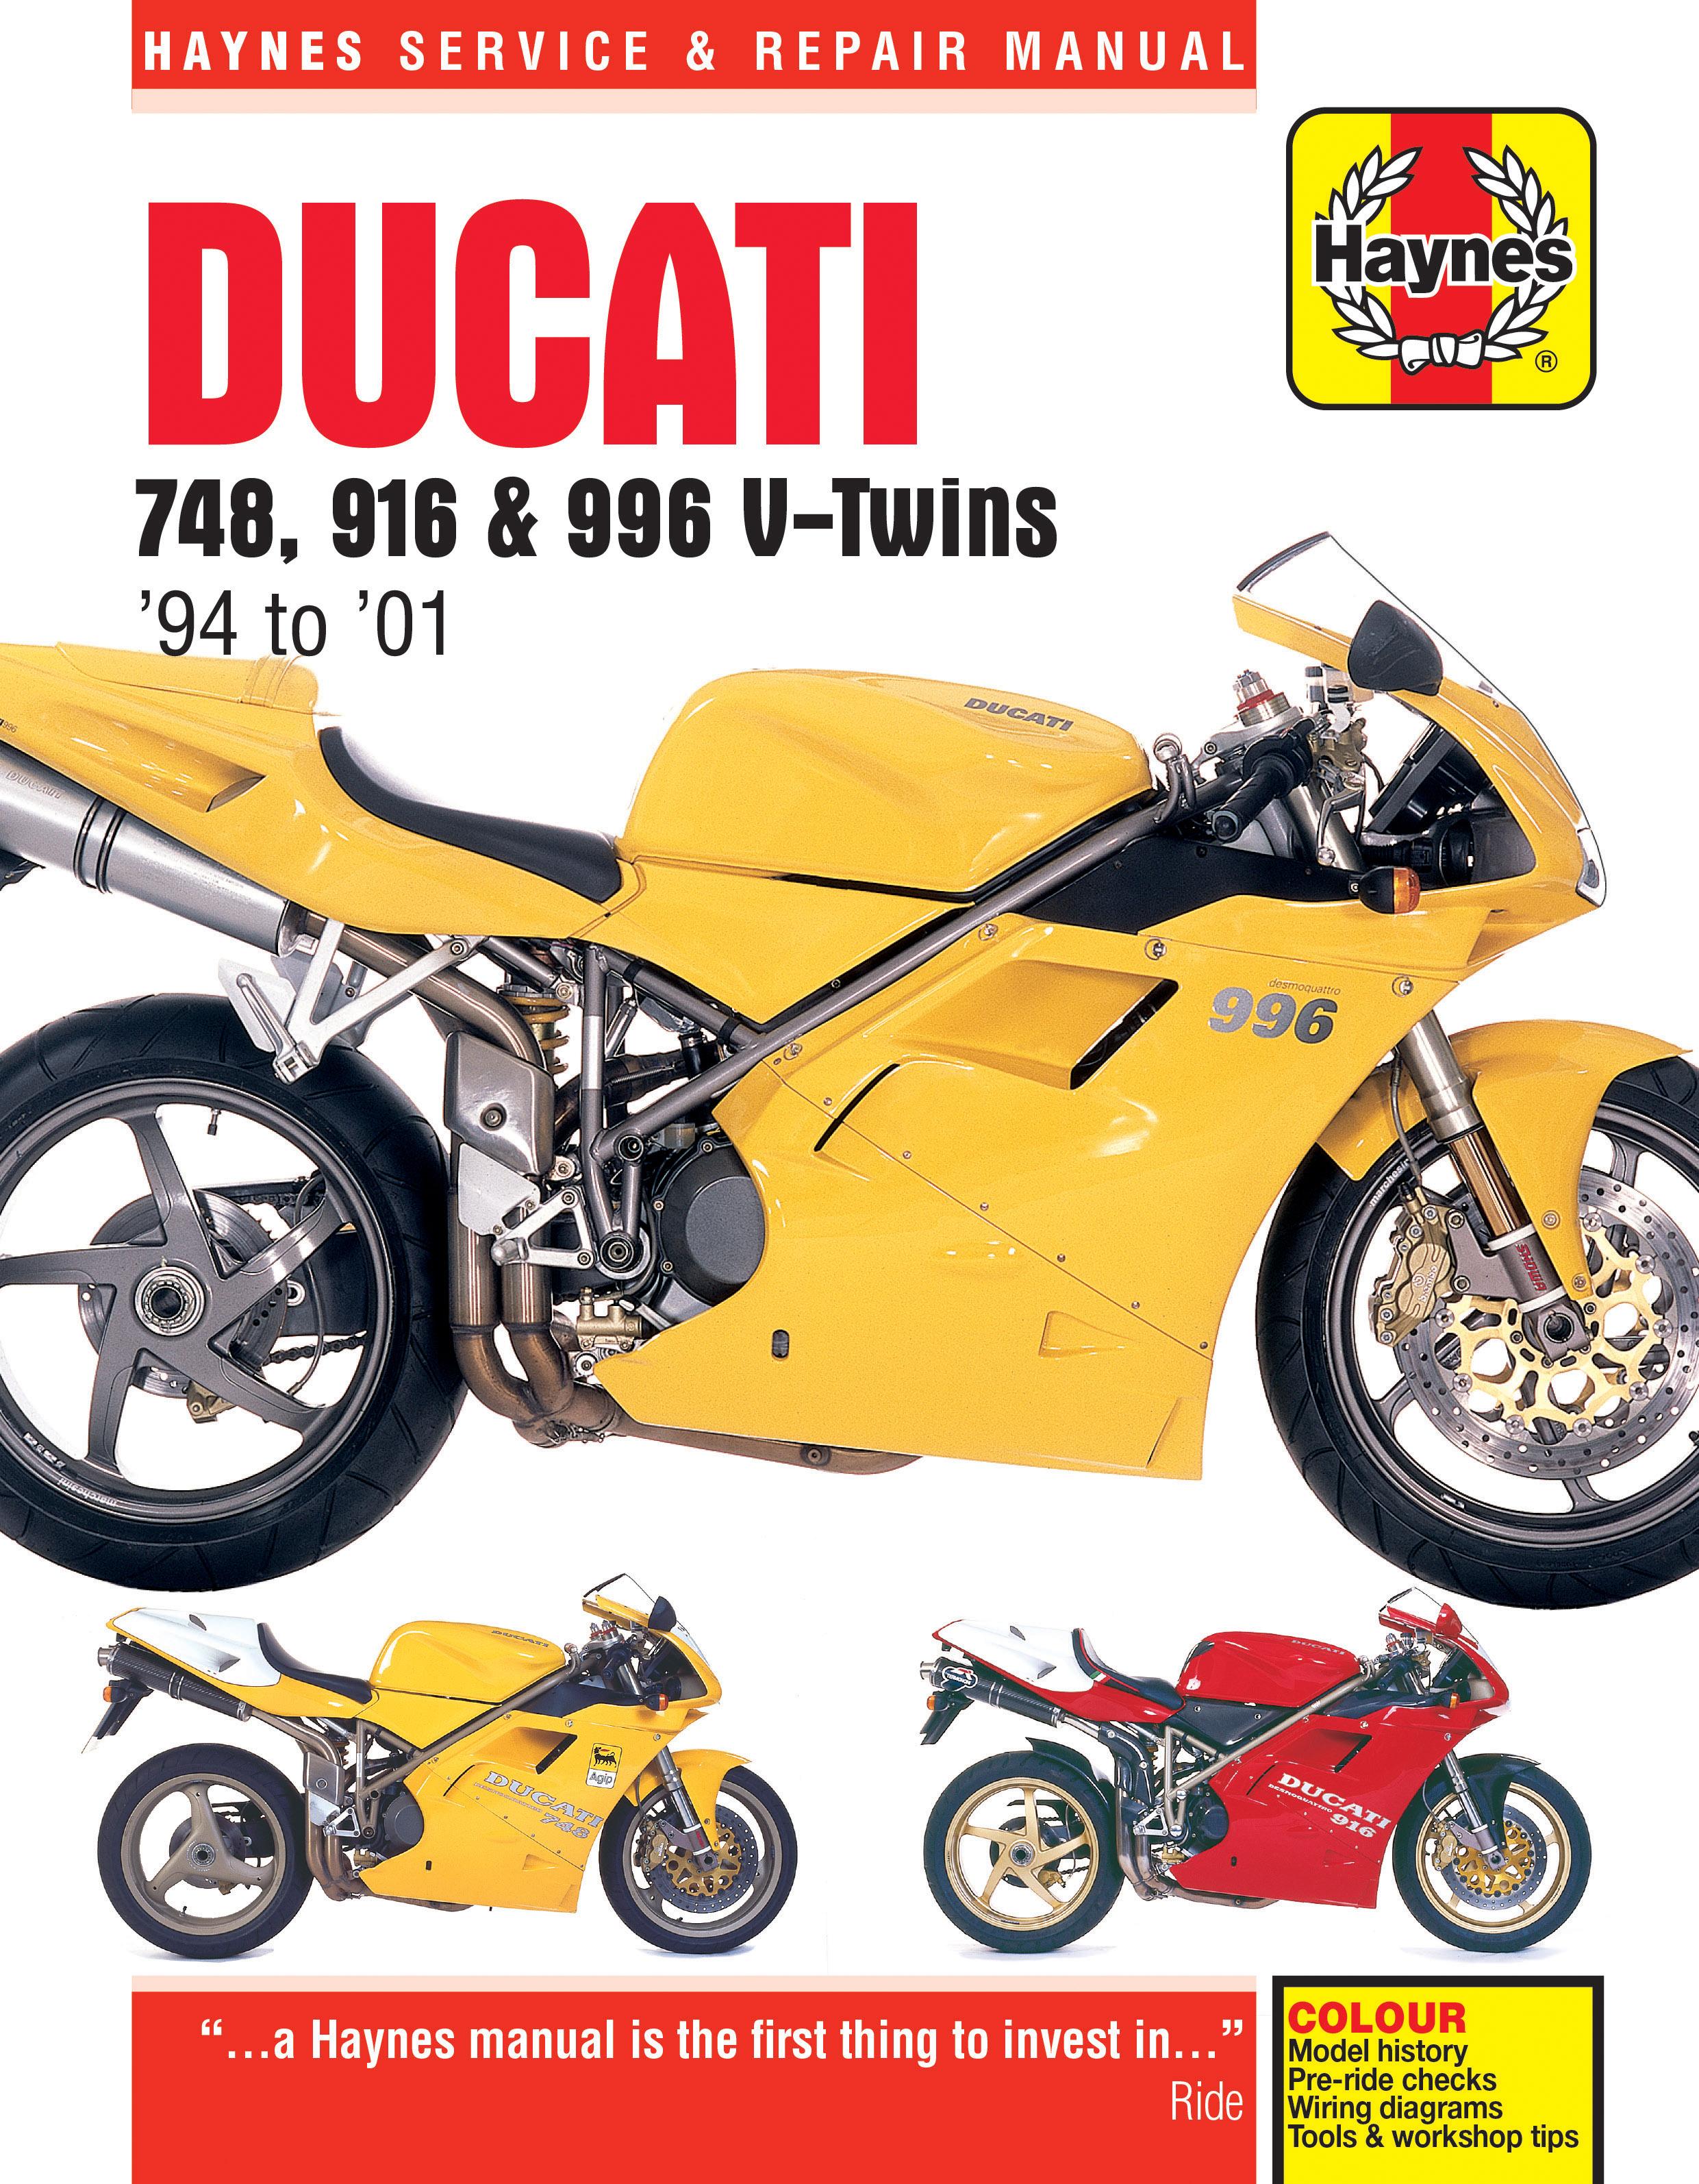 916 v twins haynes publishing Husaberg Wiring Diagram Ducati 996 Wiring Diagram #16